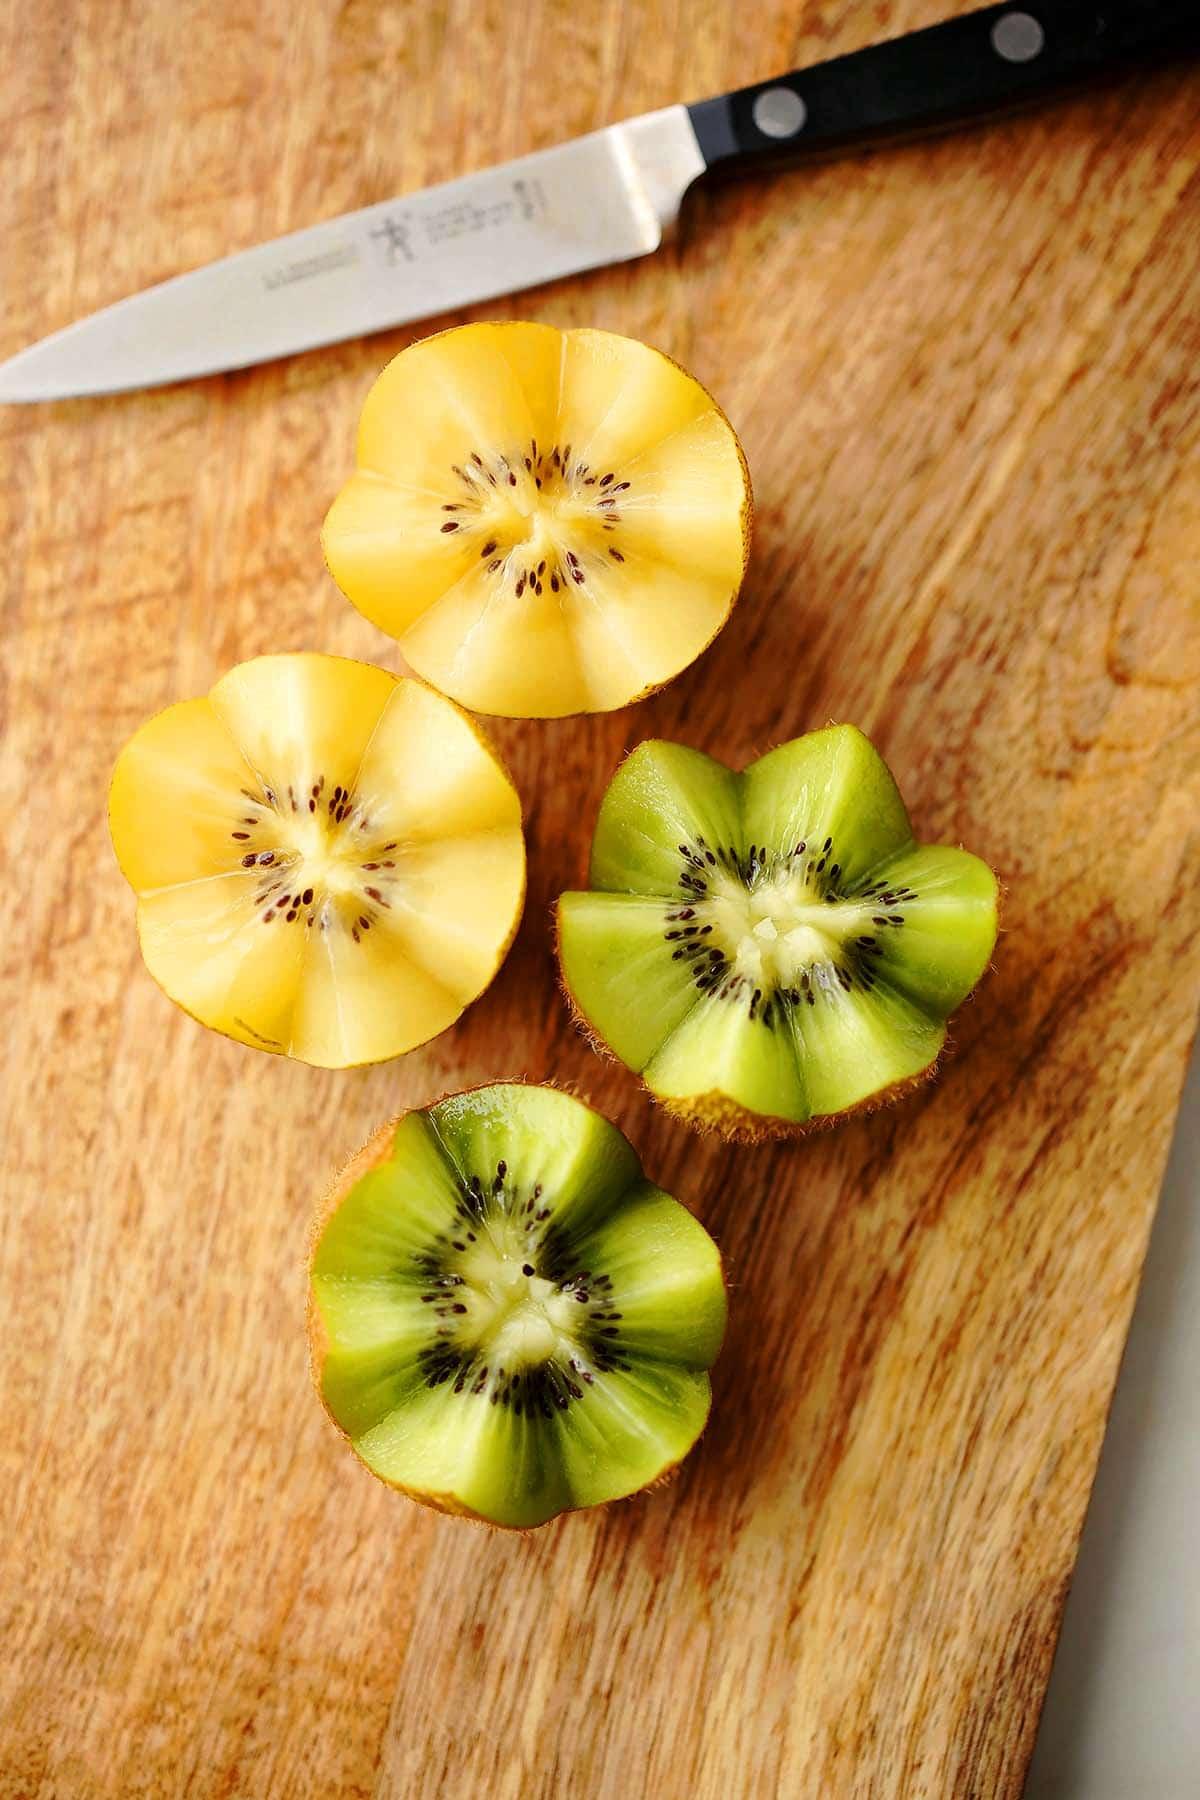 cutting board with kiwi fruit sliced in zigzag shape.